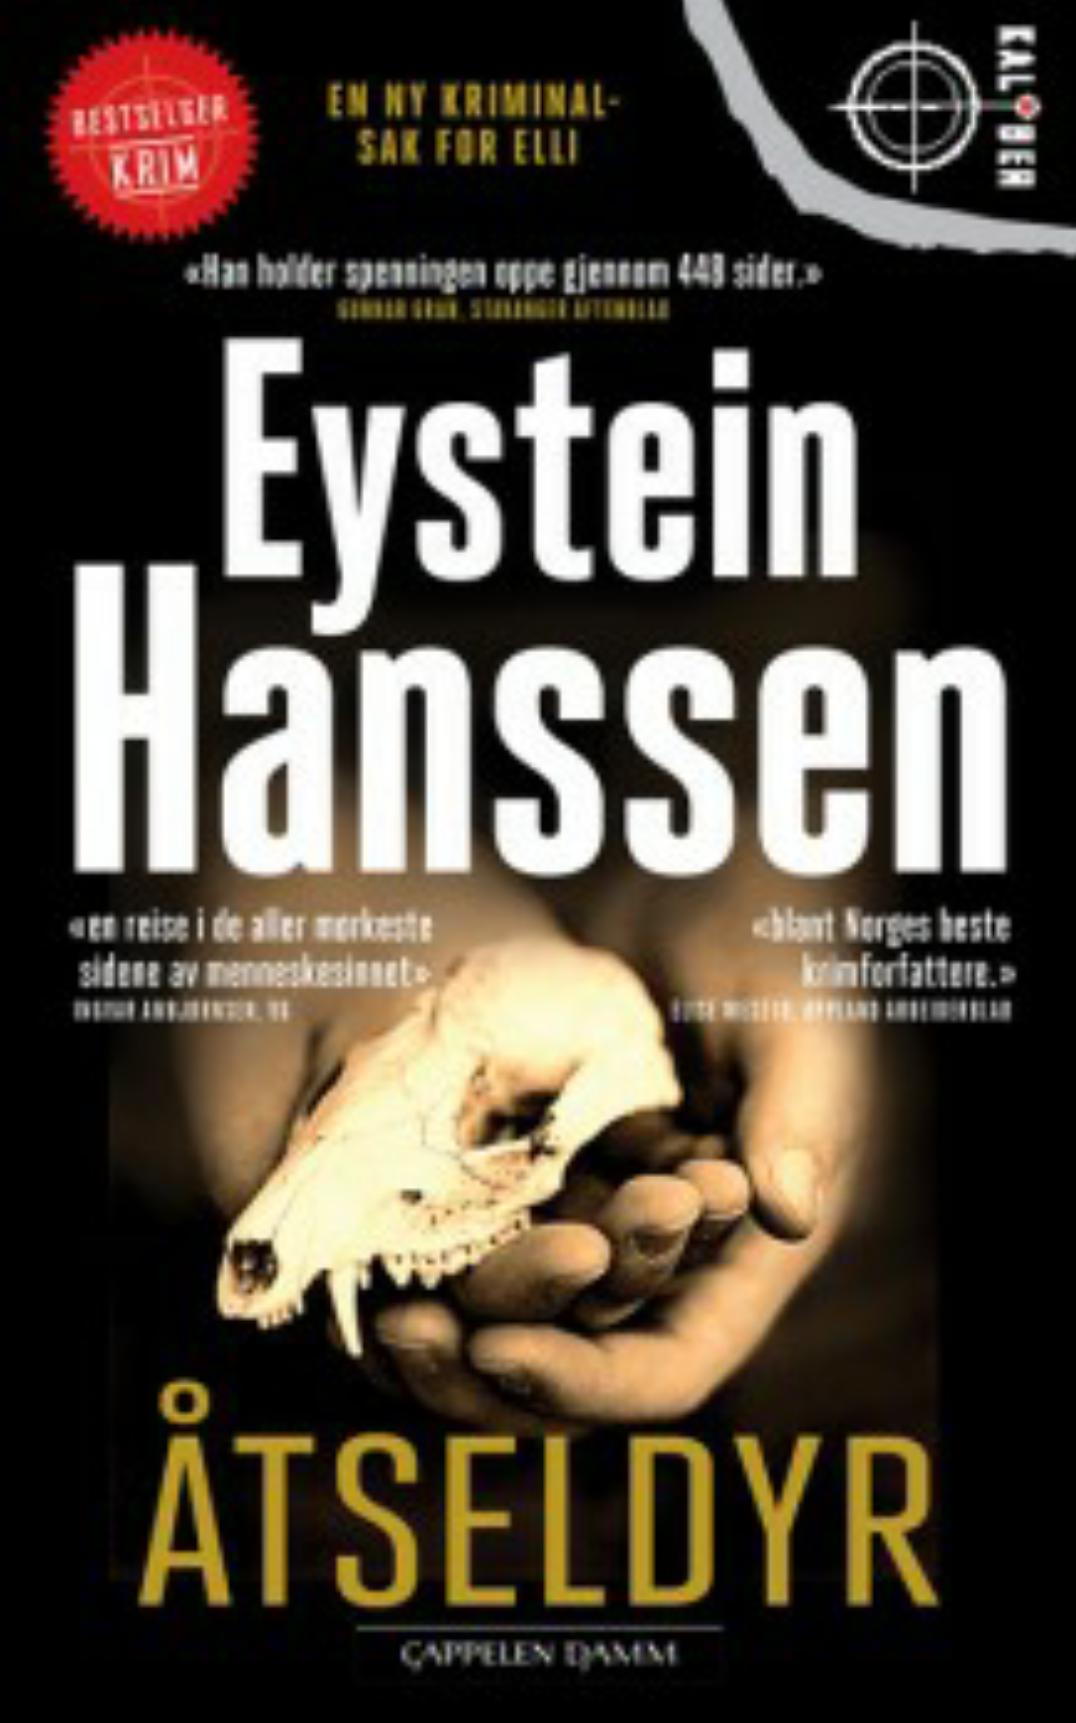 """Åtseldyr"" av Eystein Hanssen"